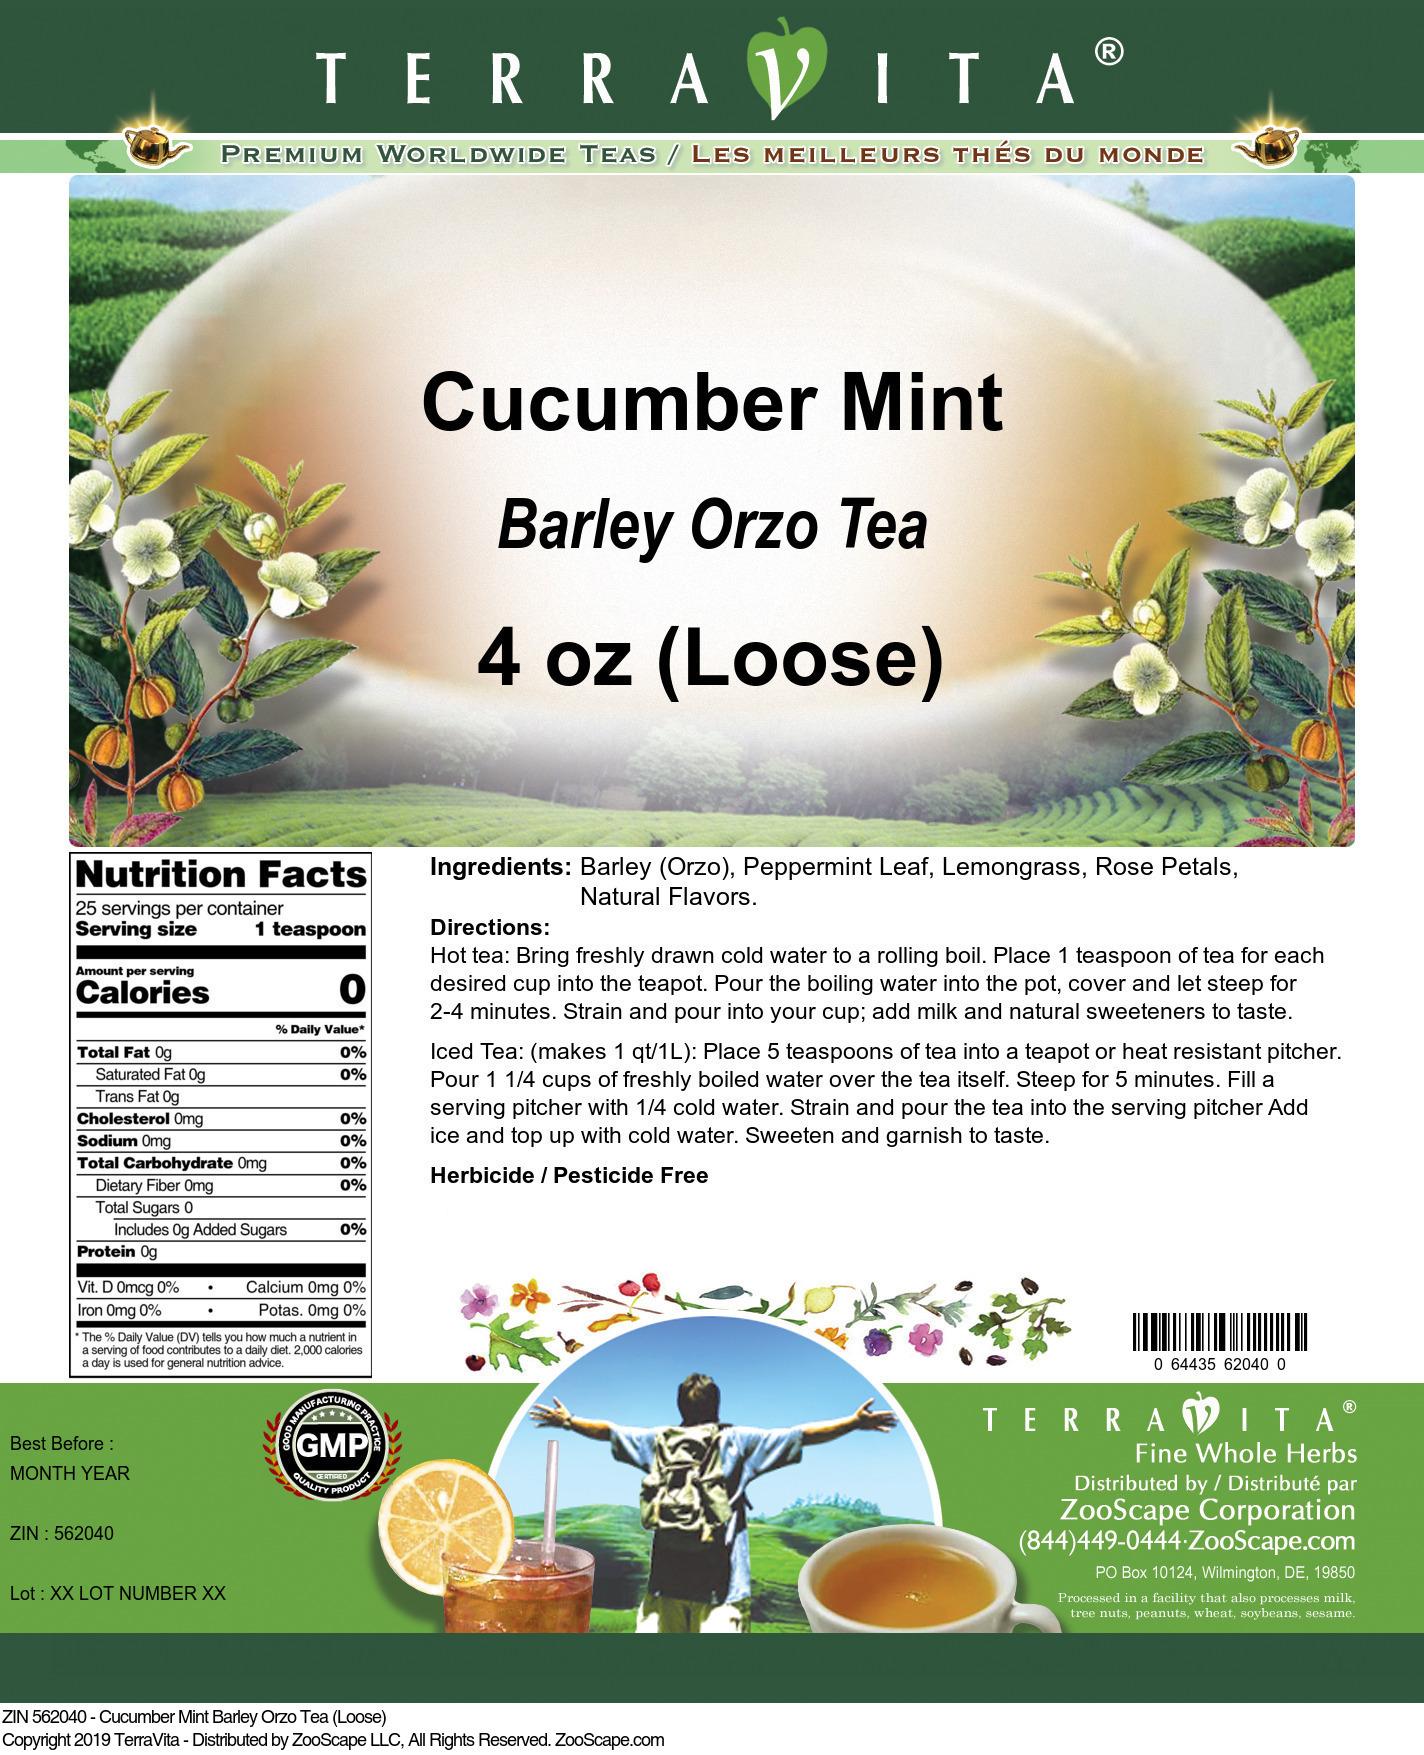 Cucumber Mint Barley Orzo Tea (Loose)